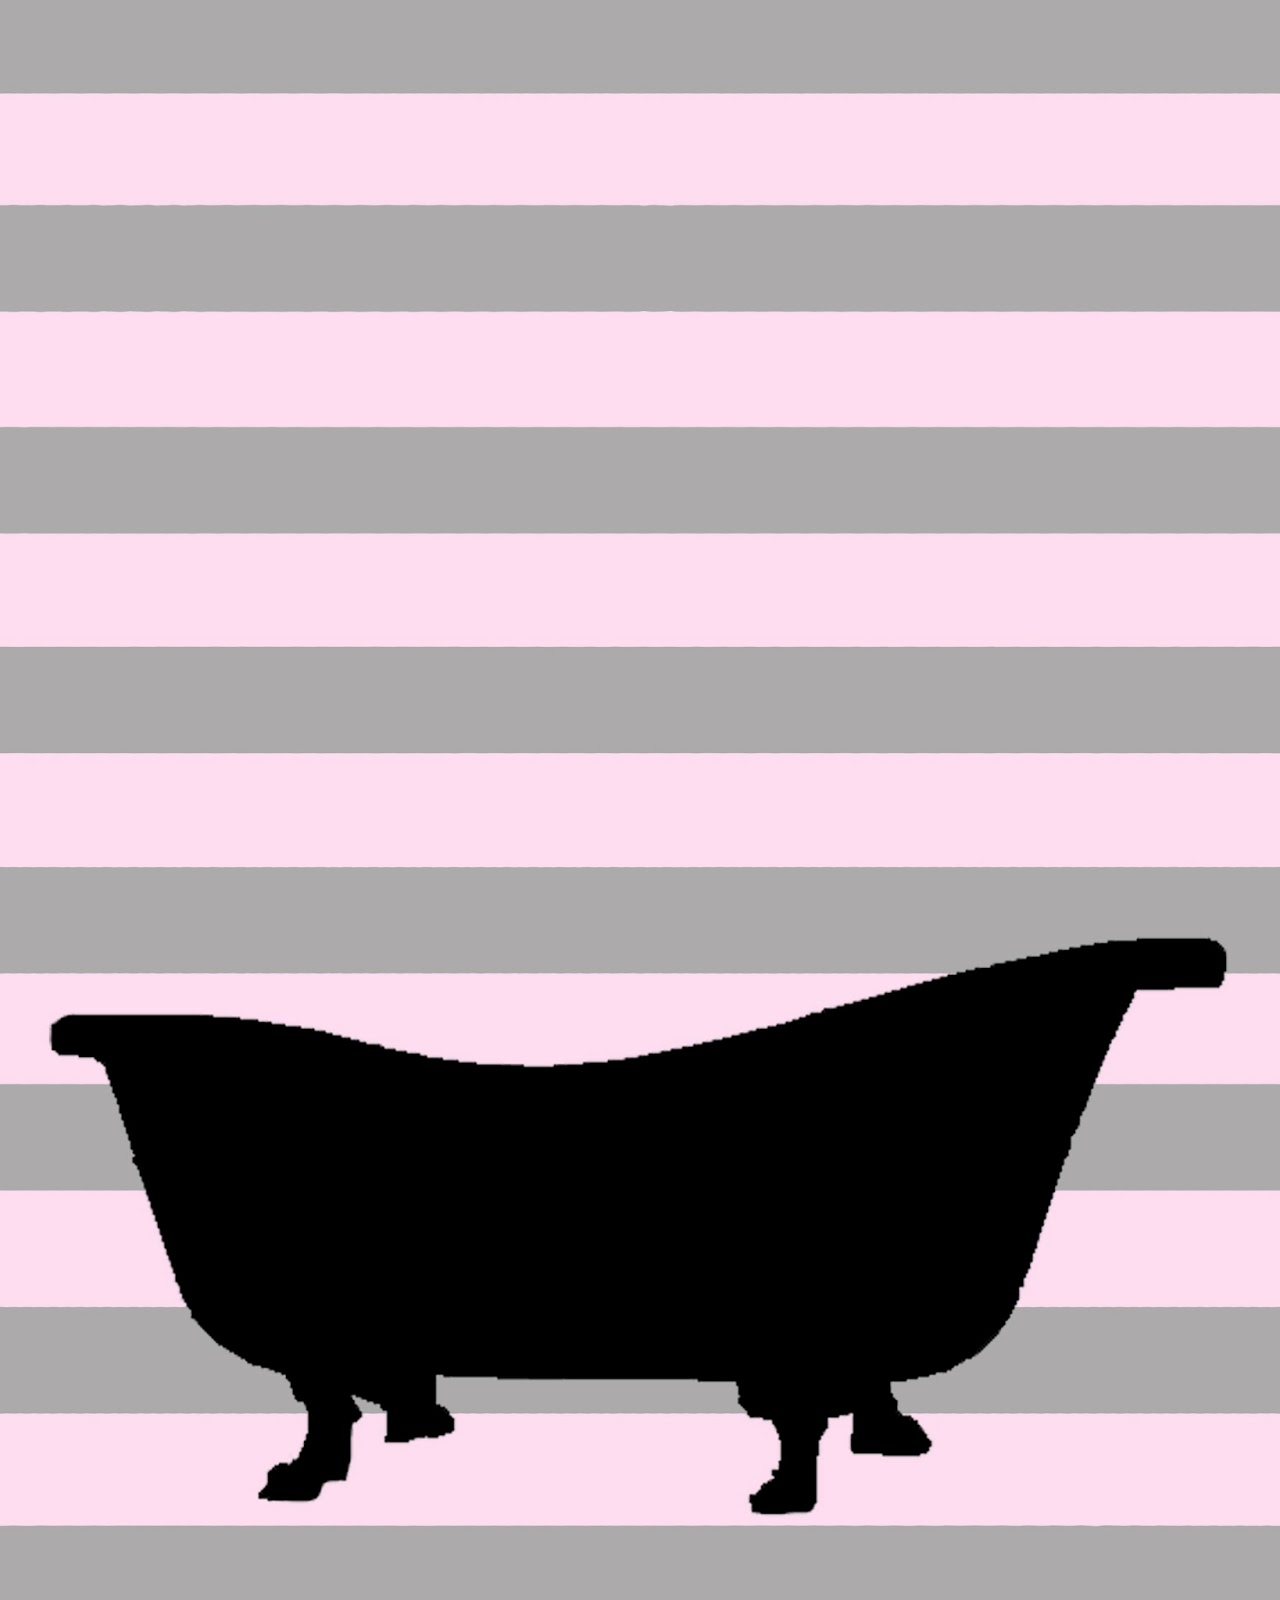 Free printable dog bubble bath clipart silhouette. Cliparts bathtub download clip